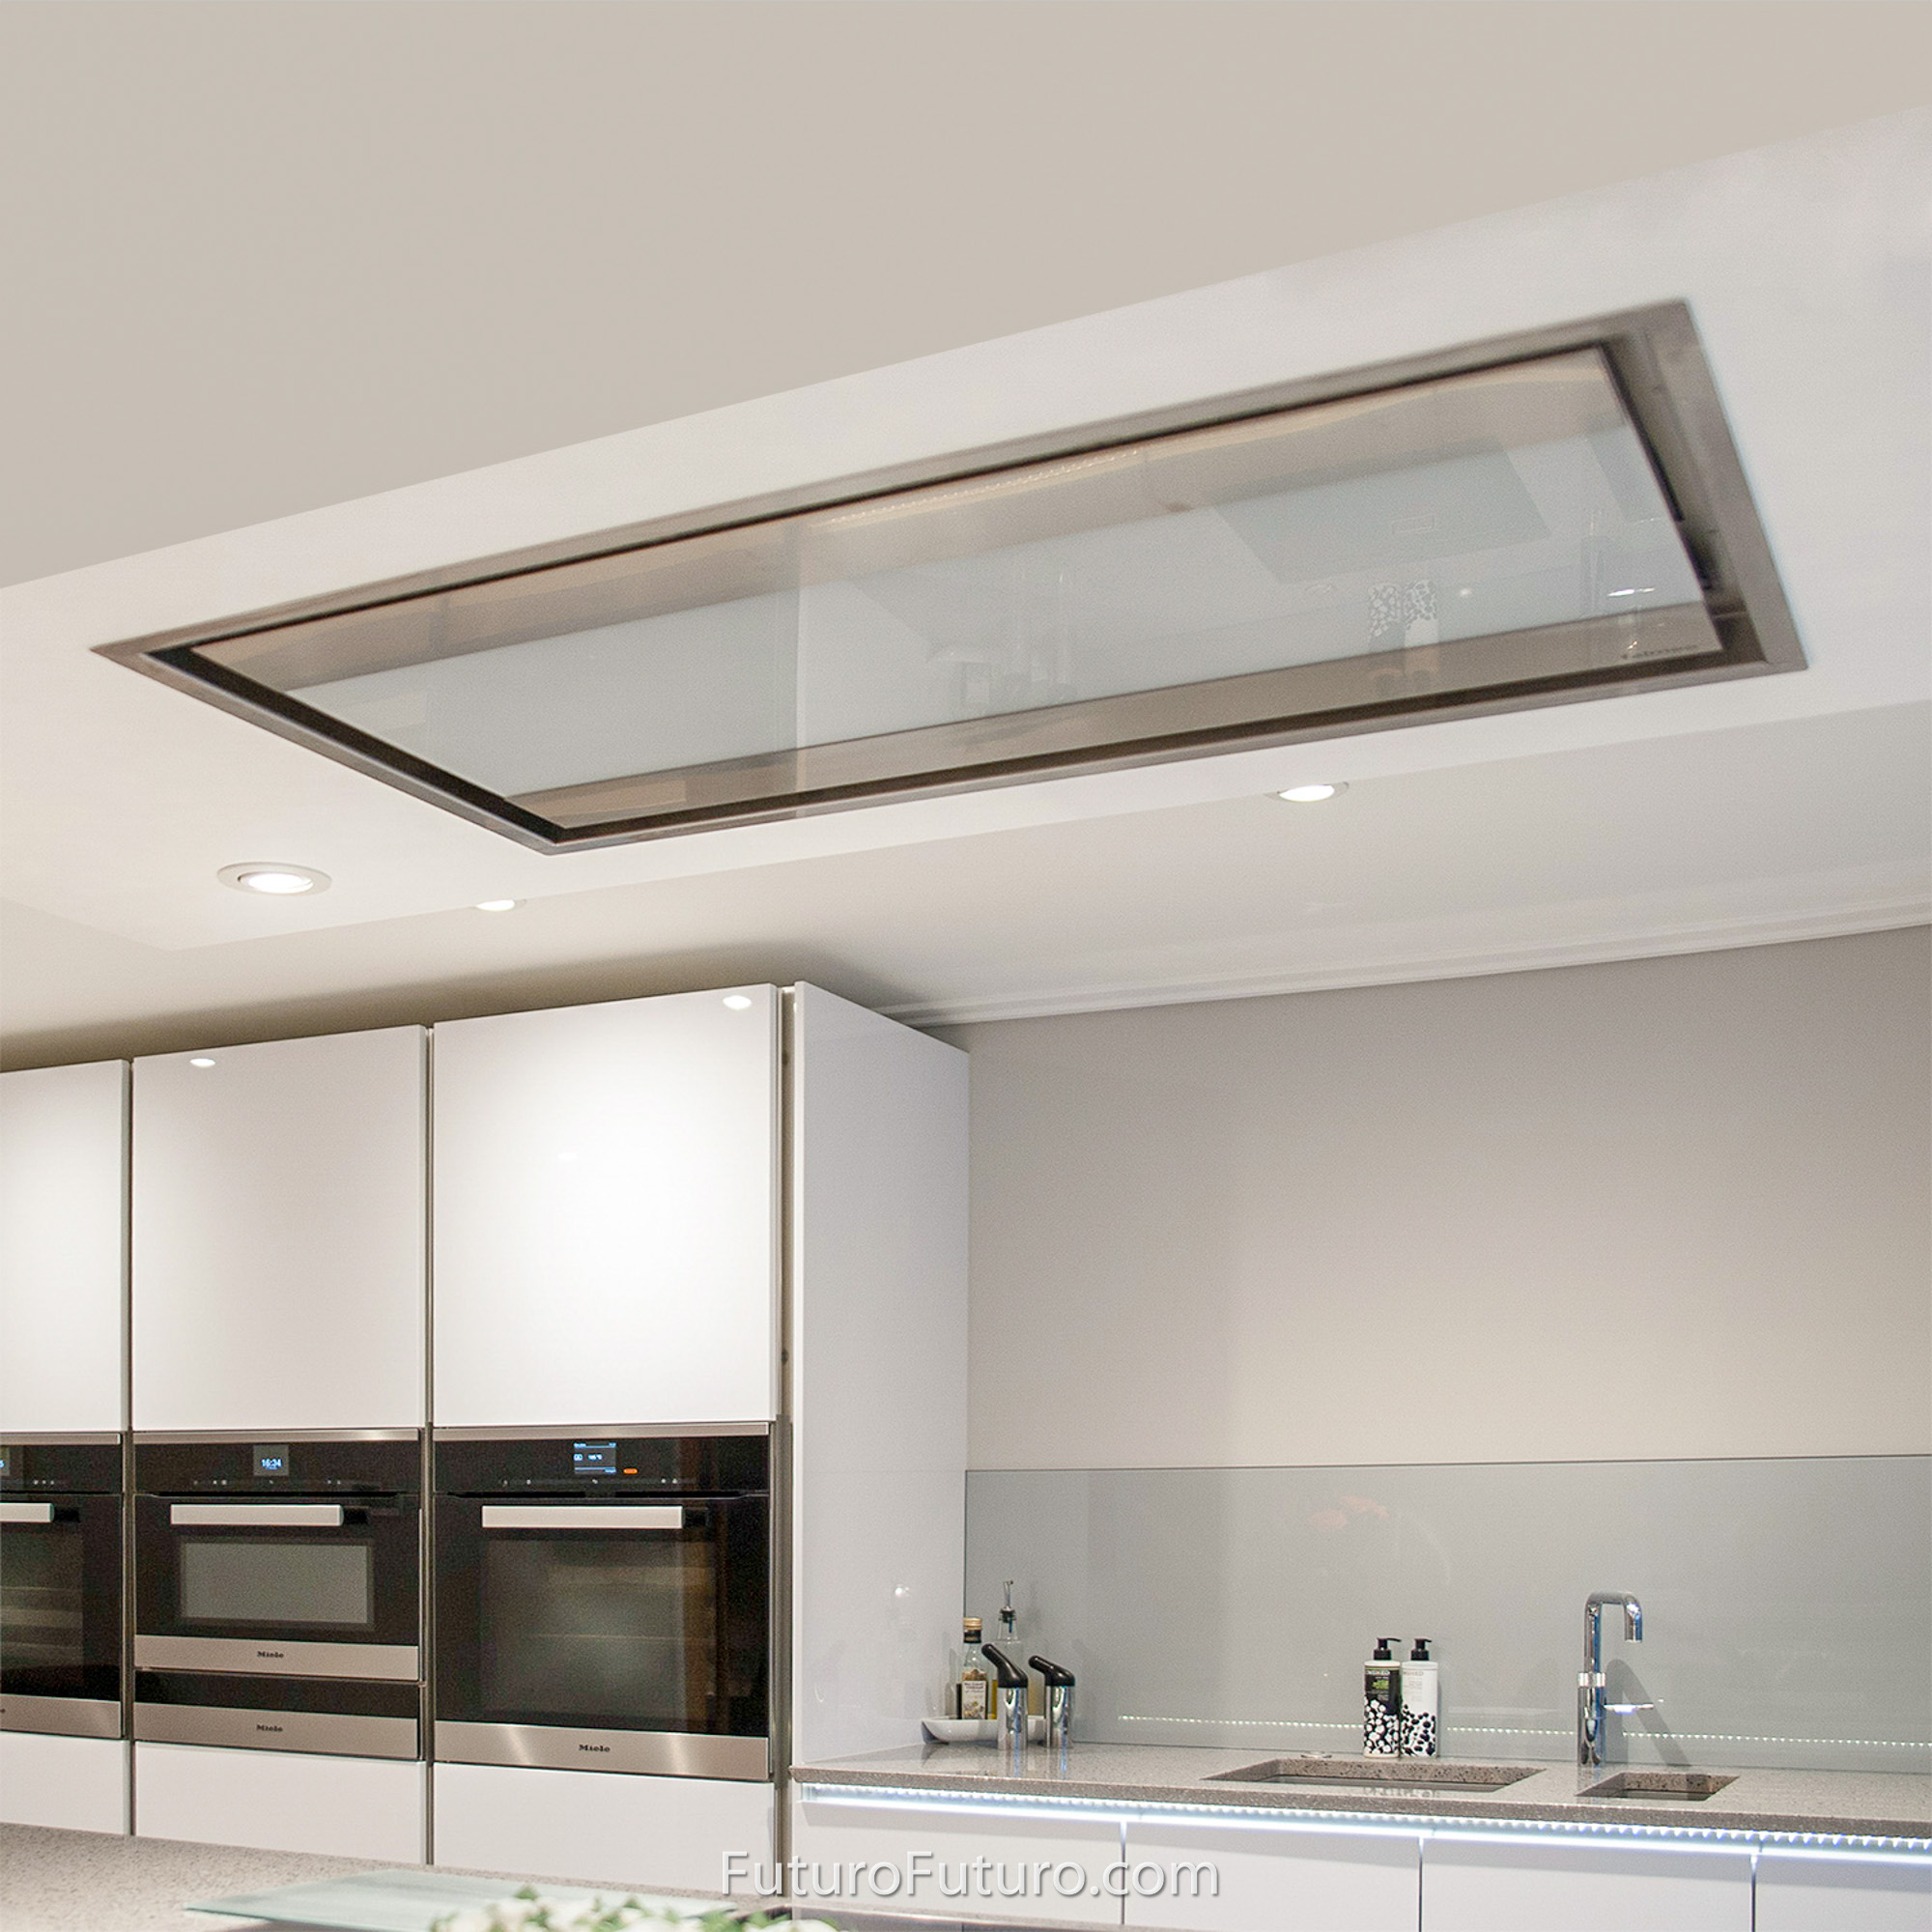 range hood 38 inch skylight ceiling soffit built in by futuro futuro